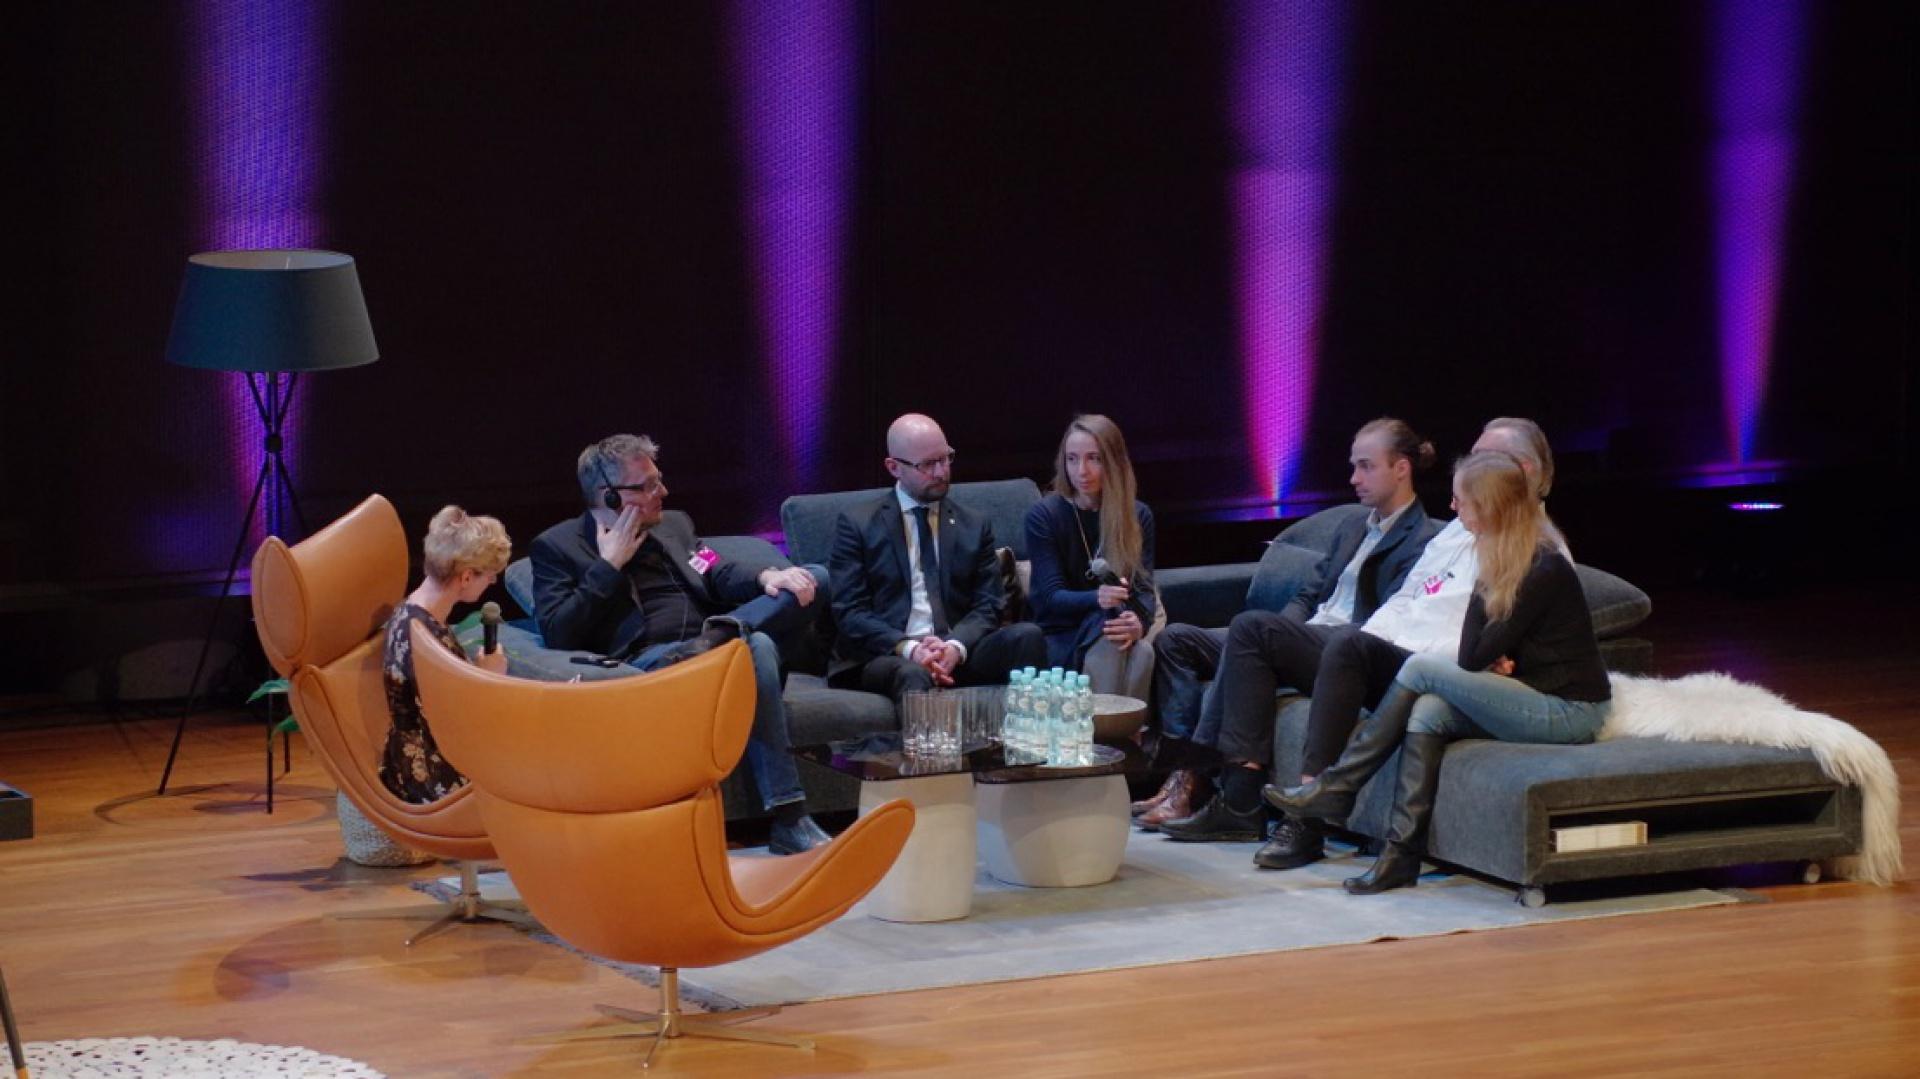 Forum Dobrego Designu, 7 grudnia 2017, sesja inauguracyjna. Fot. Piotr Waniorek